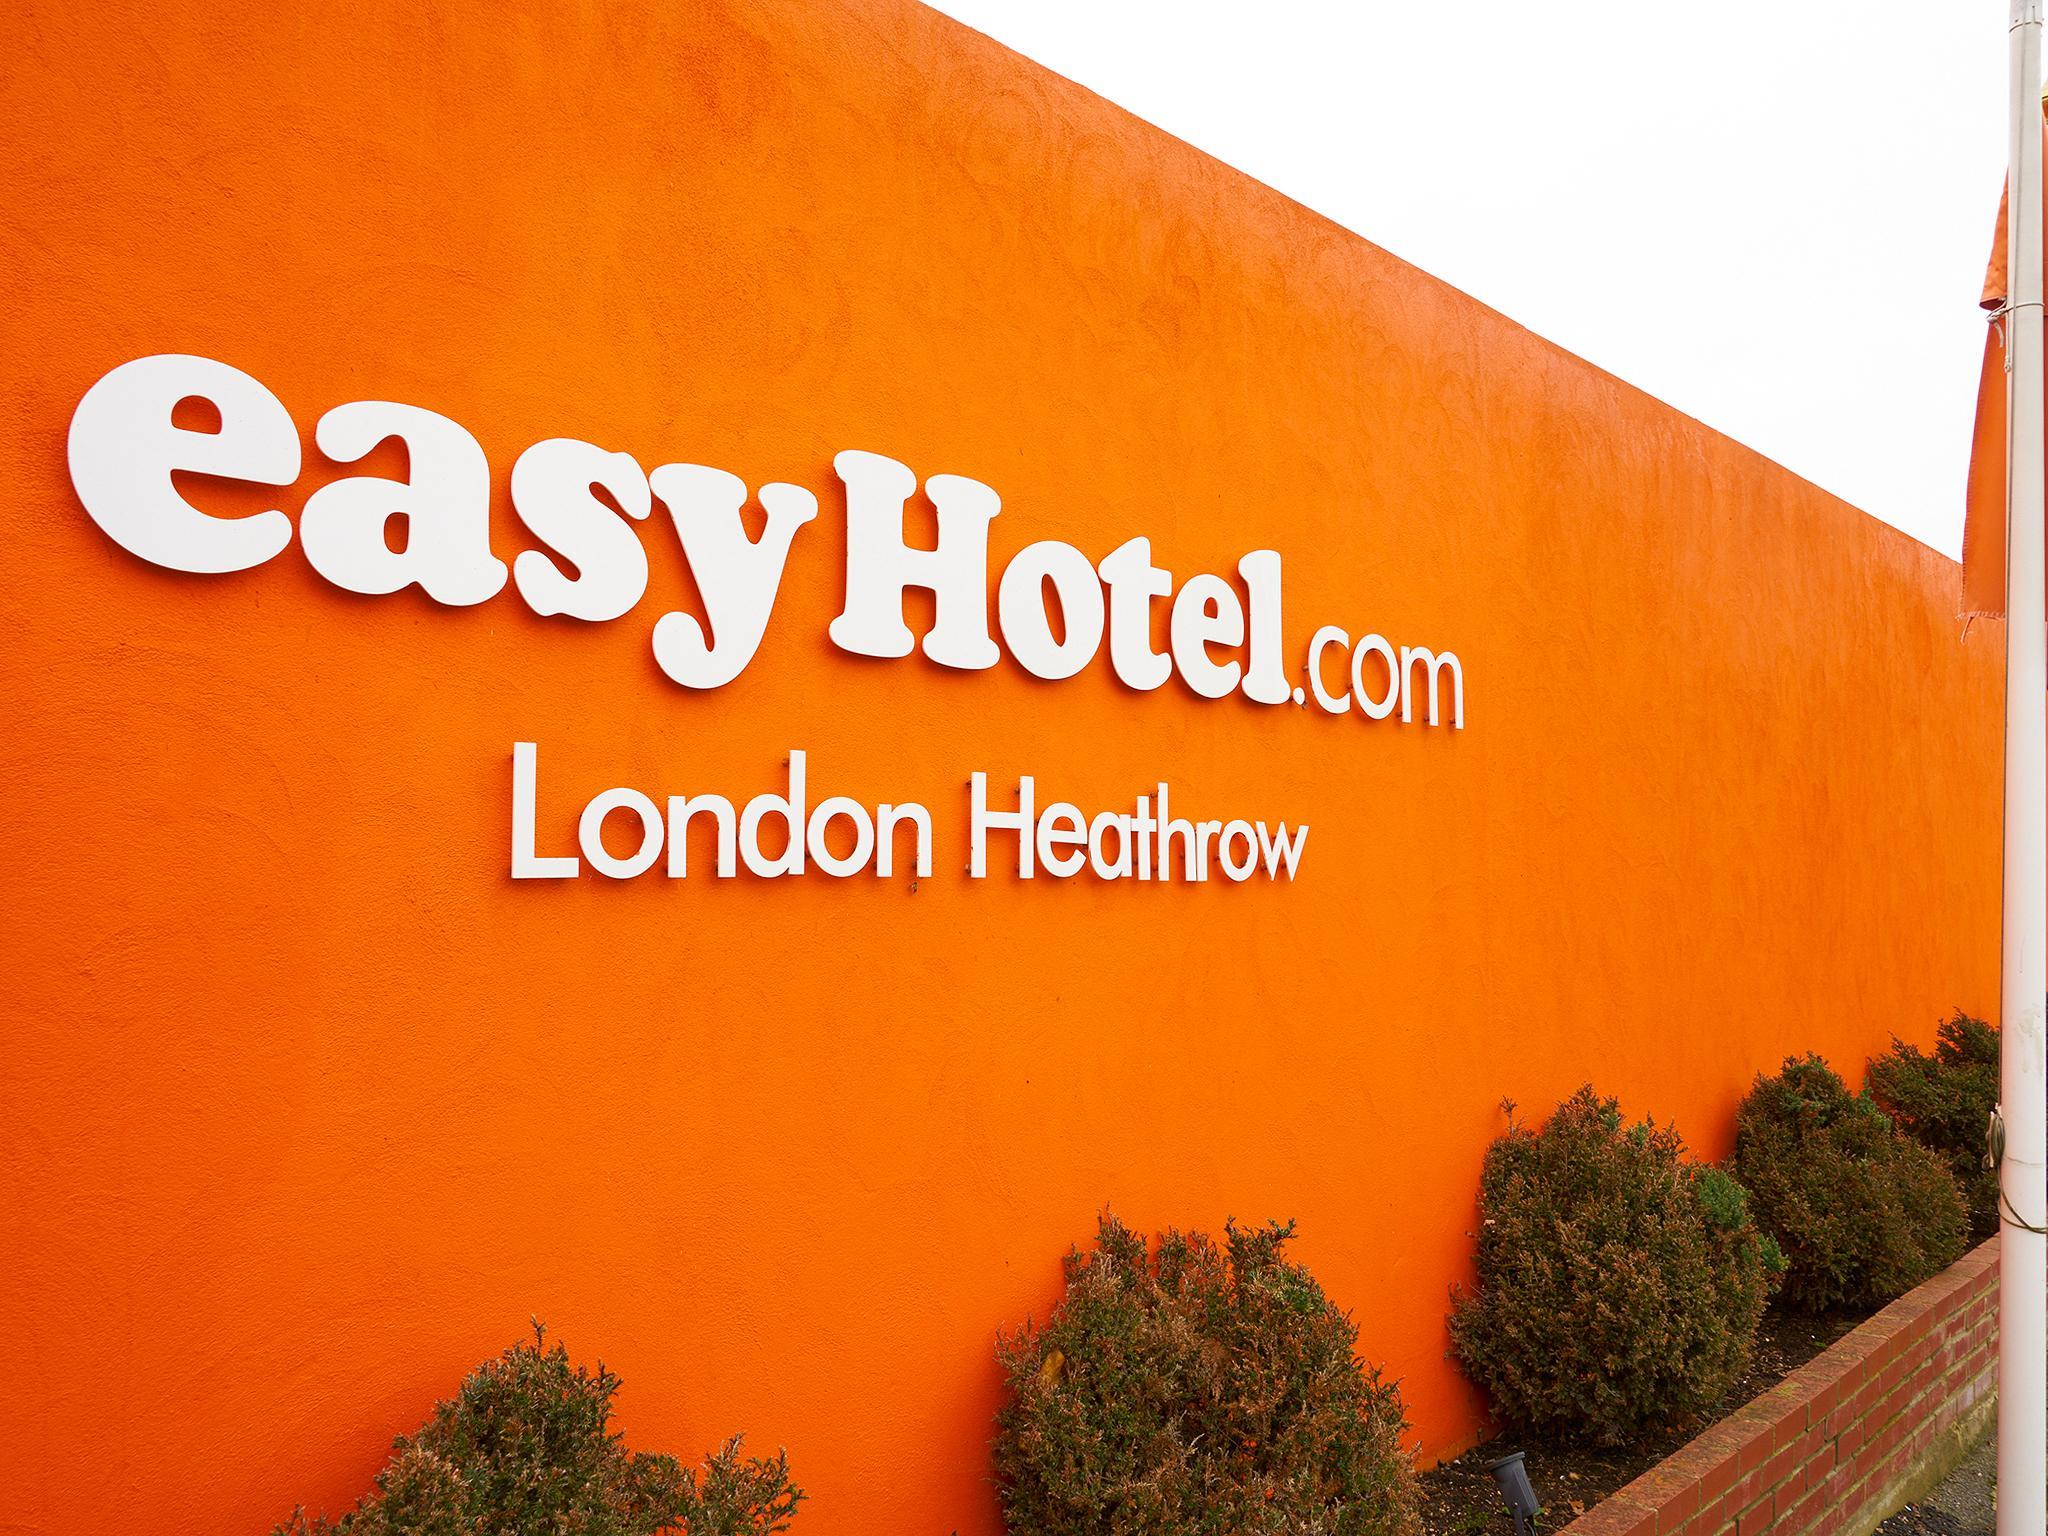 easyHotel London Heathrow, London